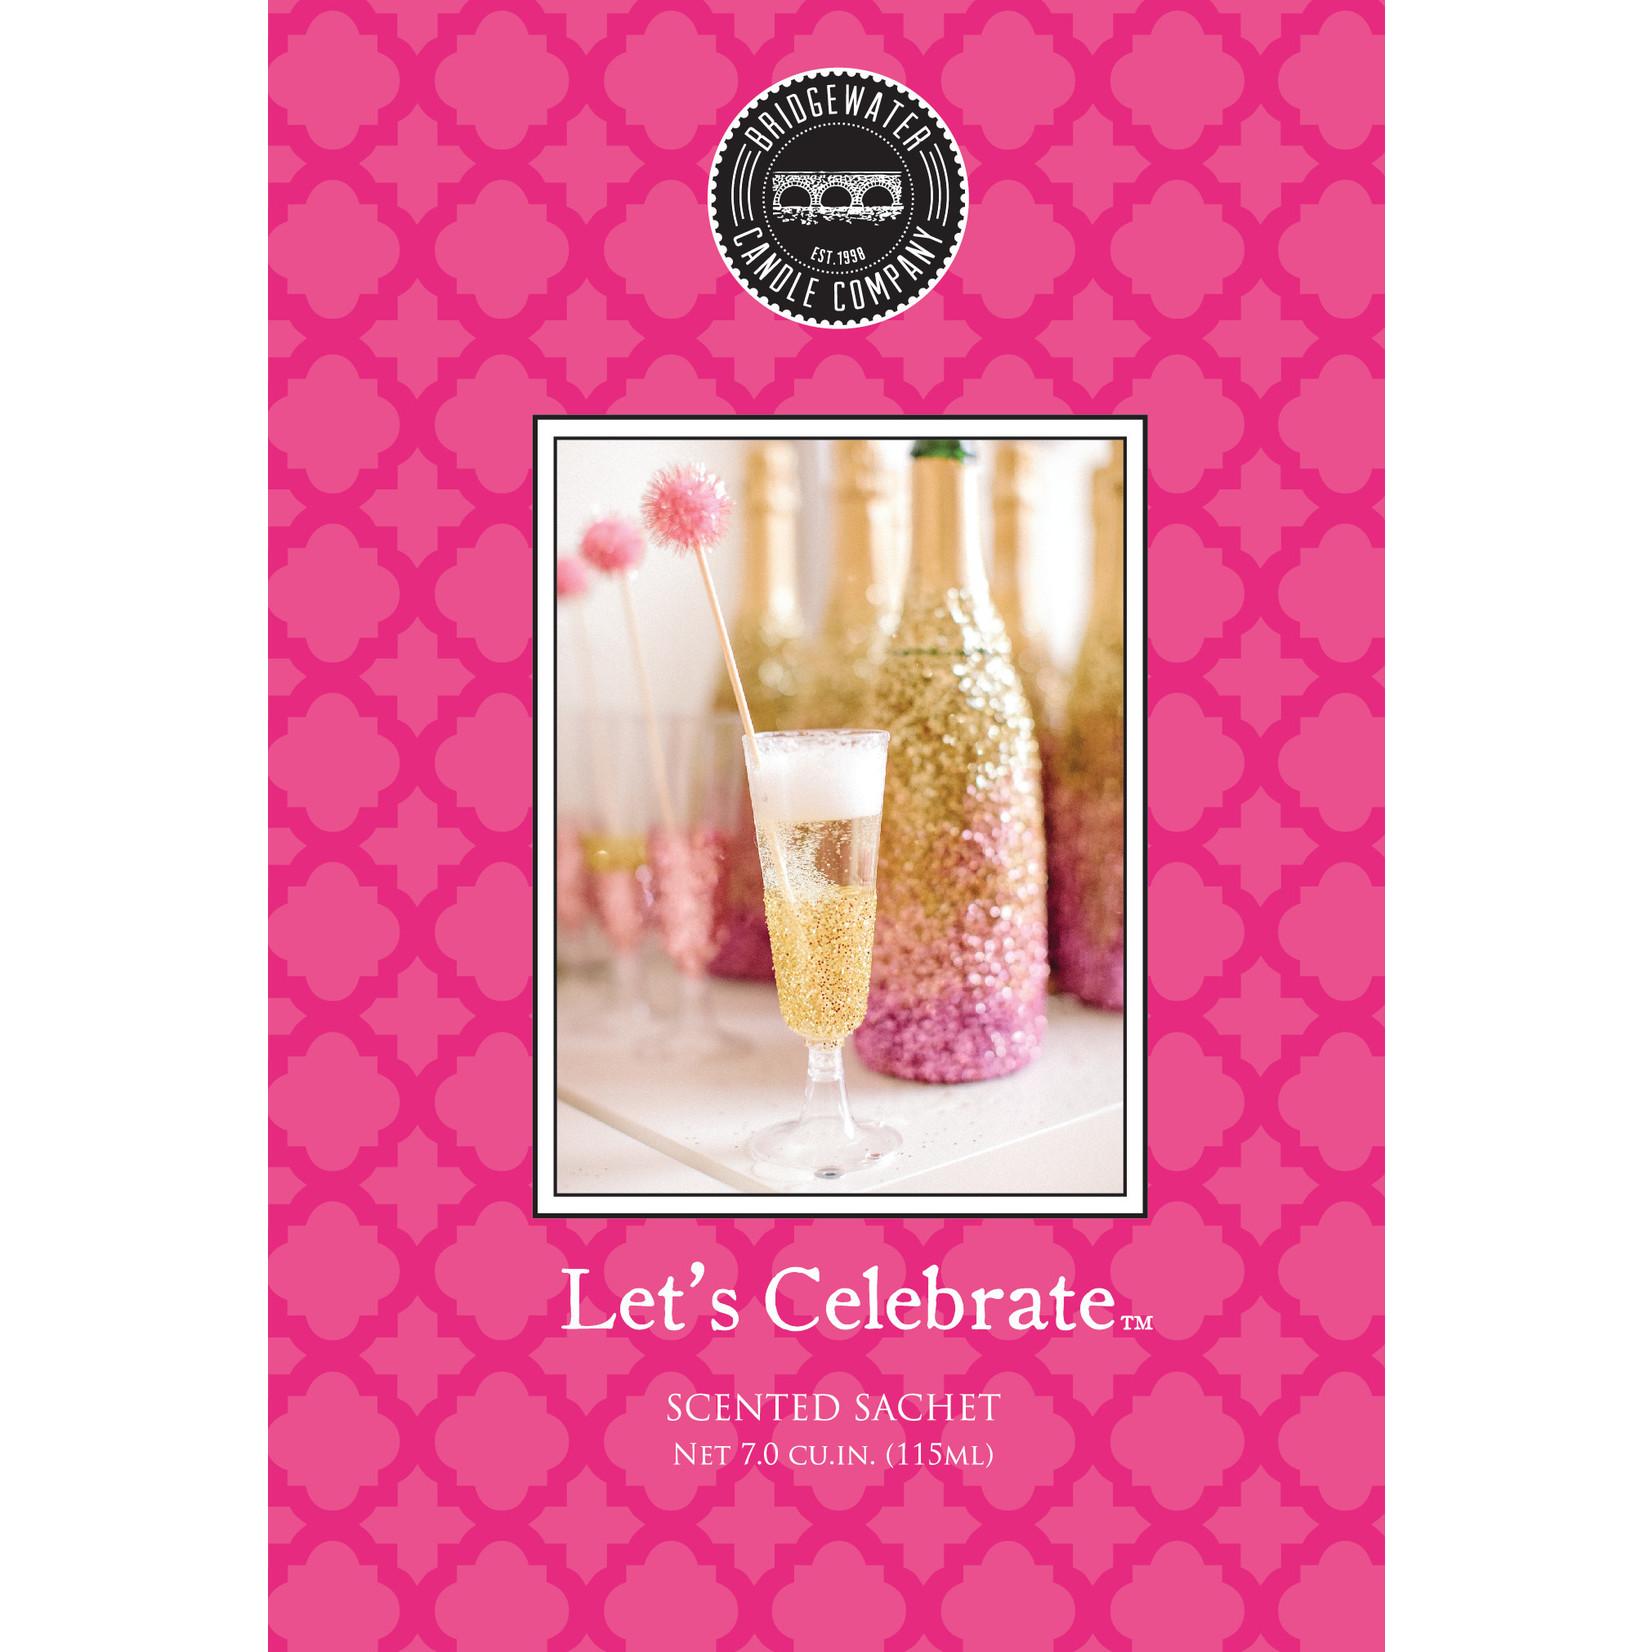 Bridgewater Scented Sachet / Geurzakje Let's Celebrate